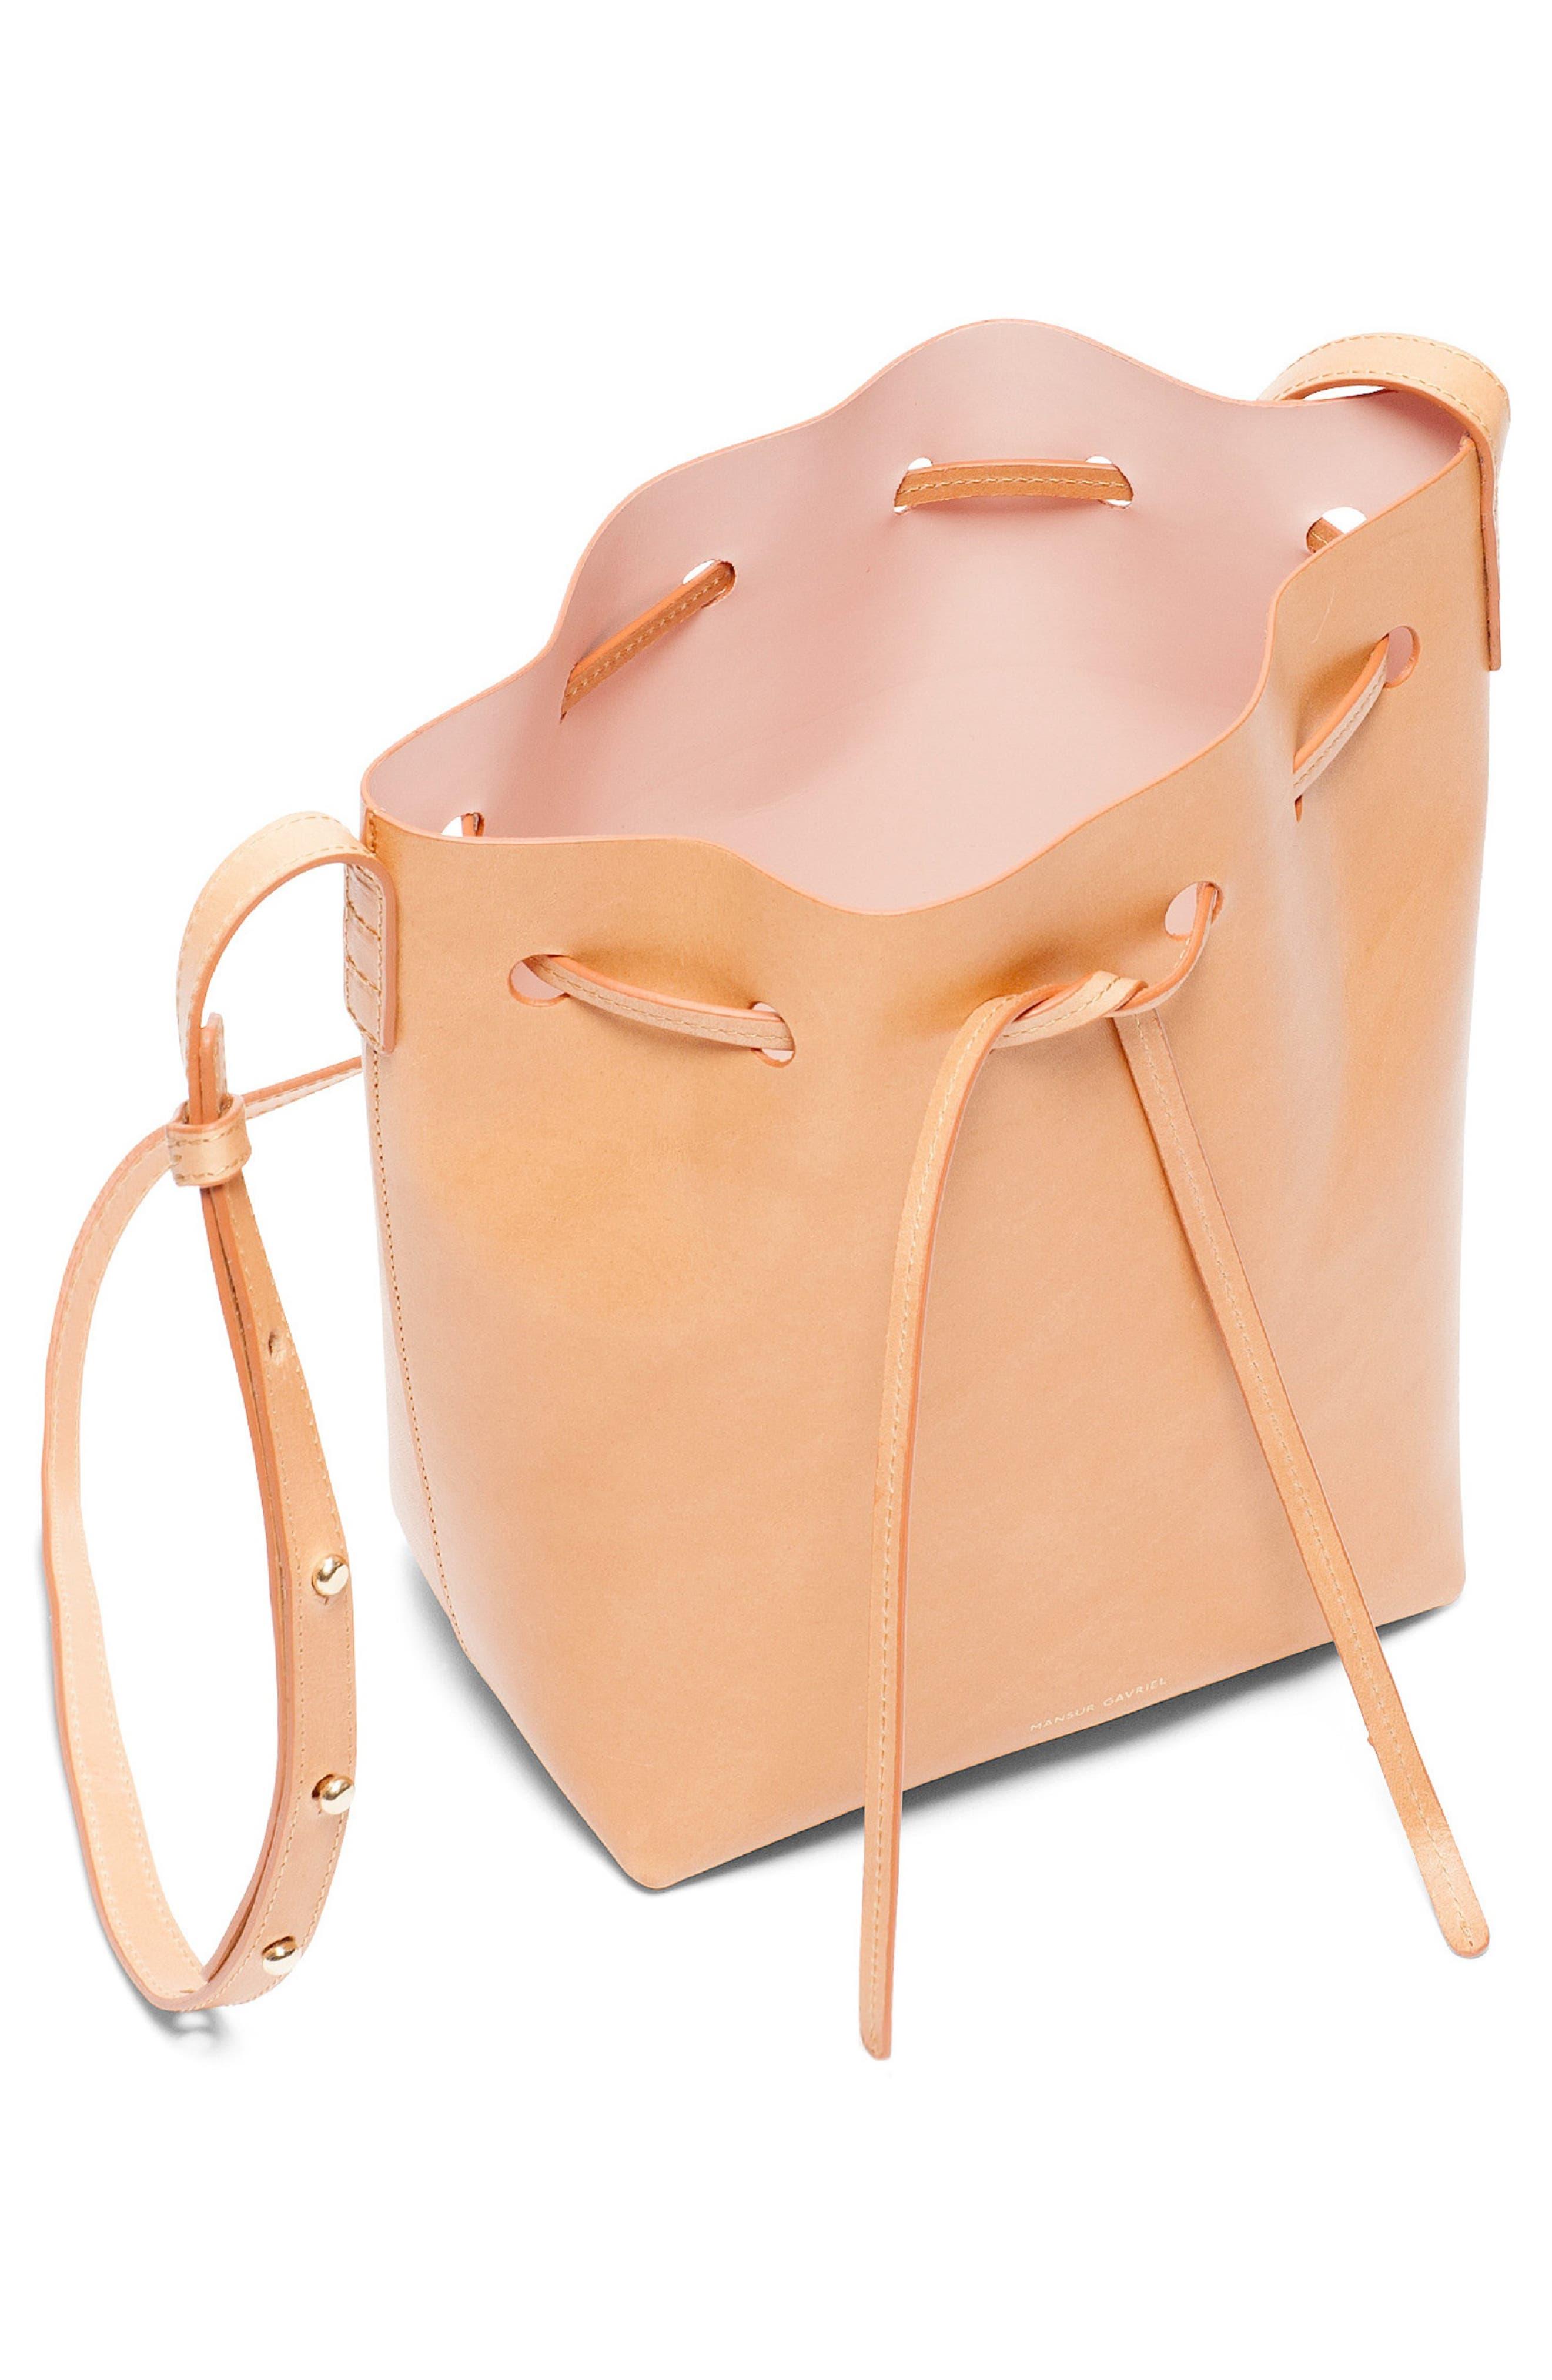 MANSUR GAVRIEL, Mini Mini Leather Bucket Bag, Alternate thumbnail 3, color, CAMMELLO/ ROSA